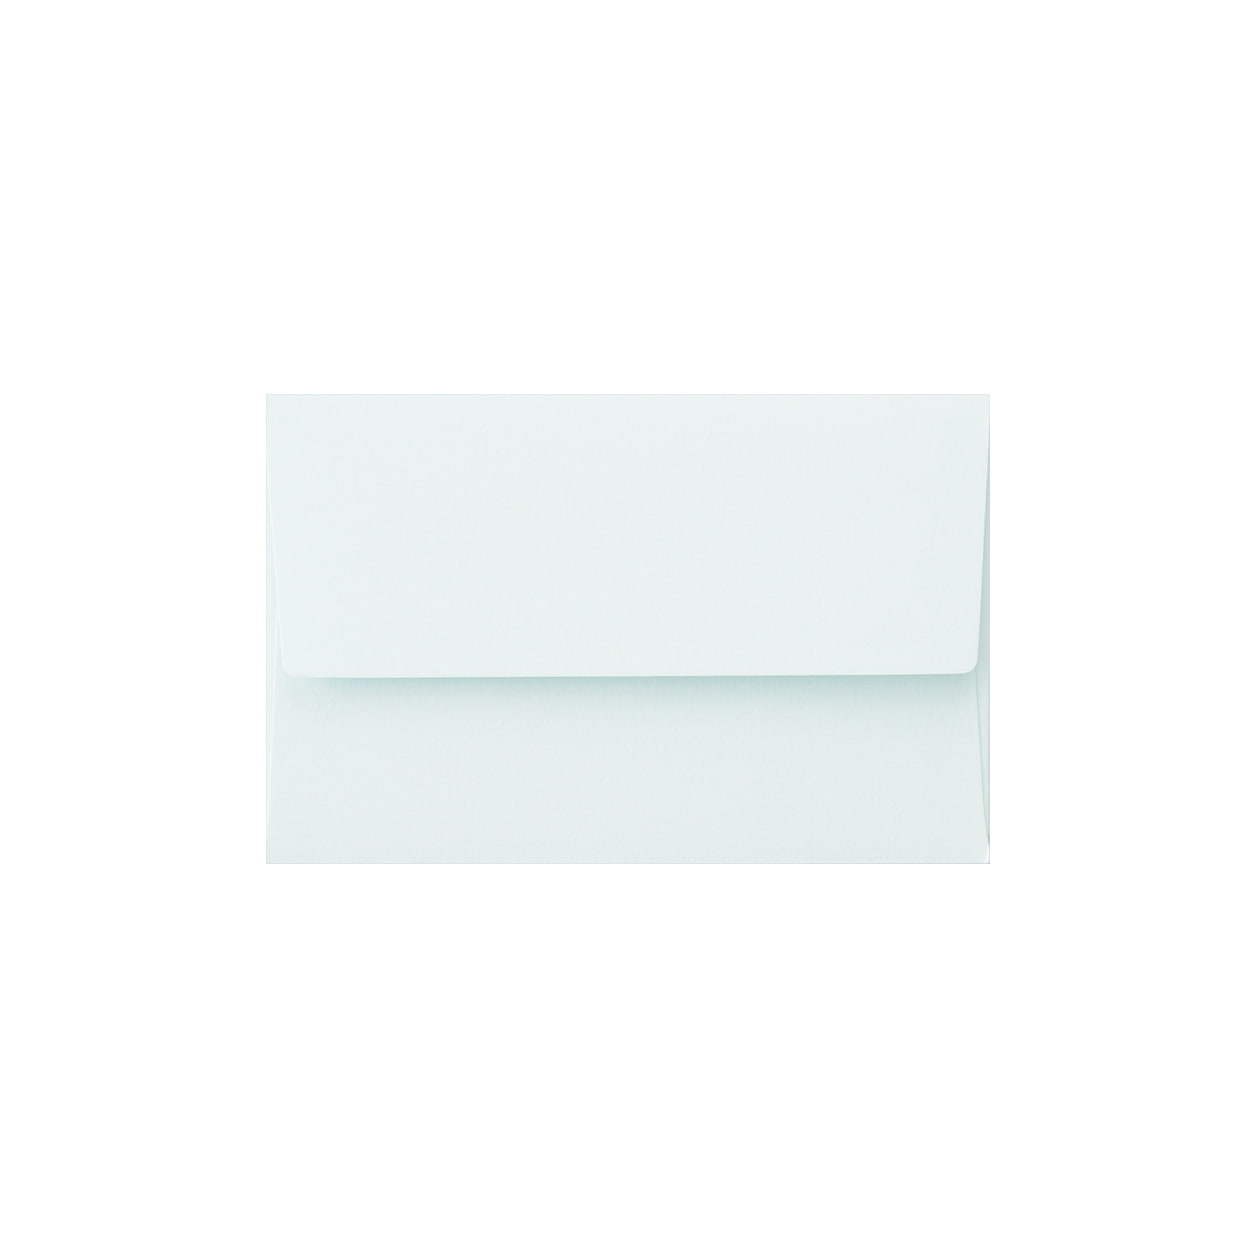 NEカマス封筒 コットン ブルー 116.3g